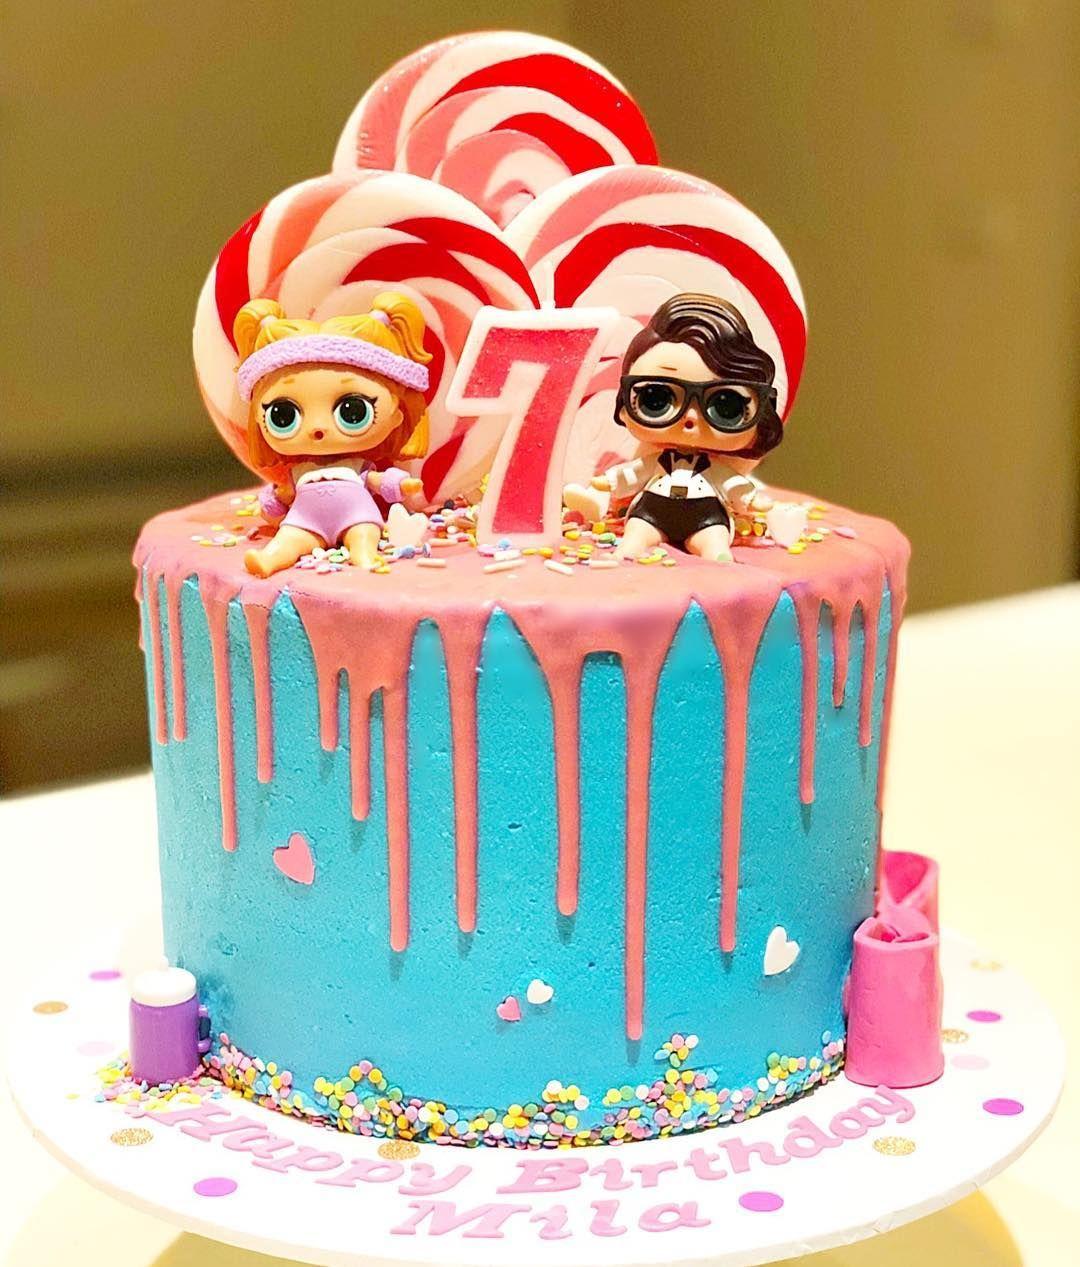 Milas 7th Birthday L.O.L Surprise Cake!!! LOLsurprise